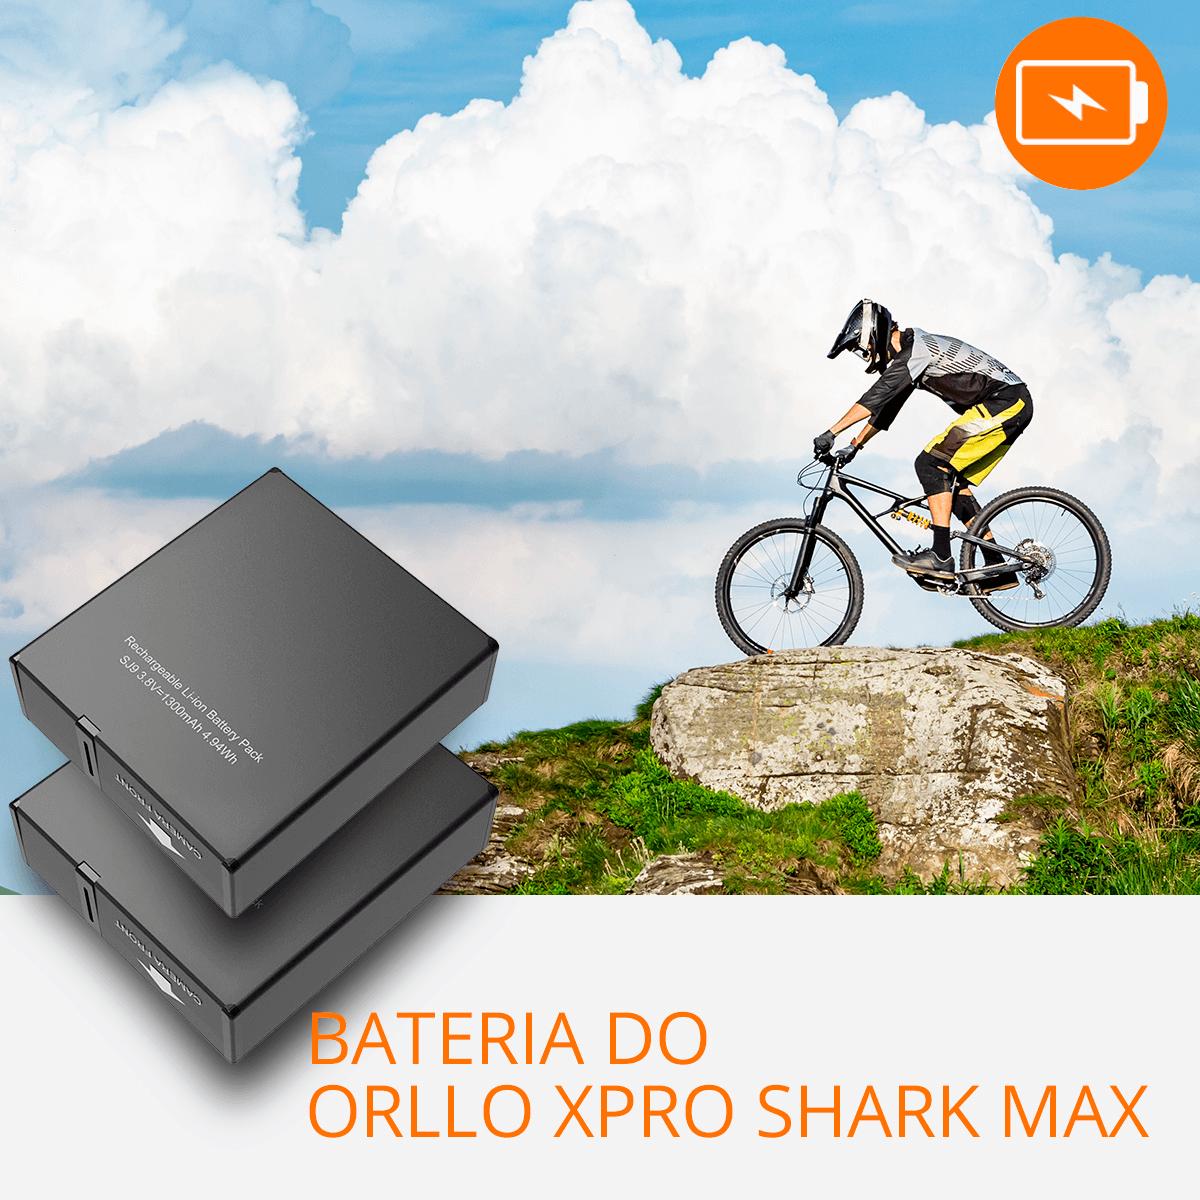 bateria-oryginalna-do-orllo-xpro-shark-max